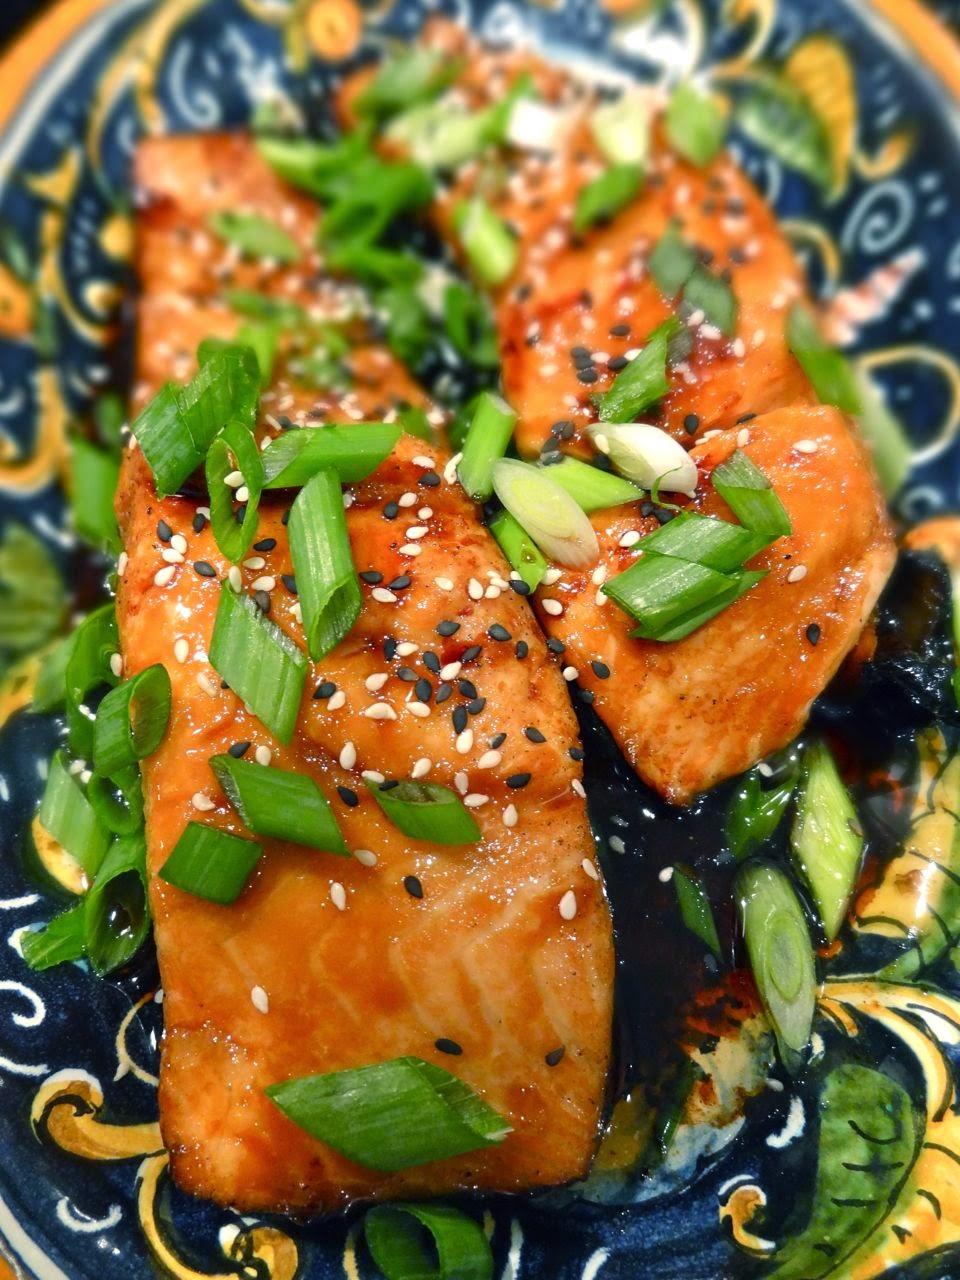 Scrumpdillyicious: Salmon Teriyaki with Bok Choy, Mushrooms & Noodle